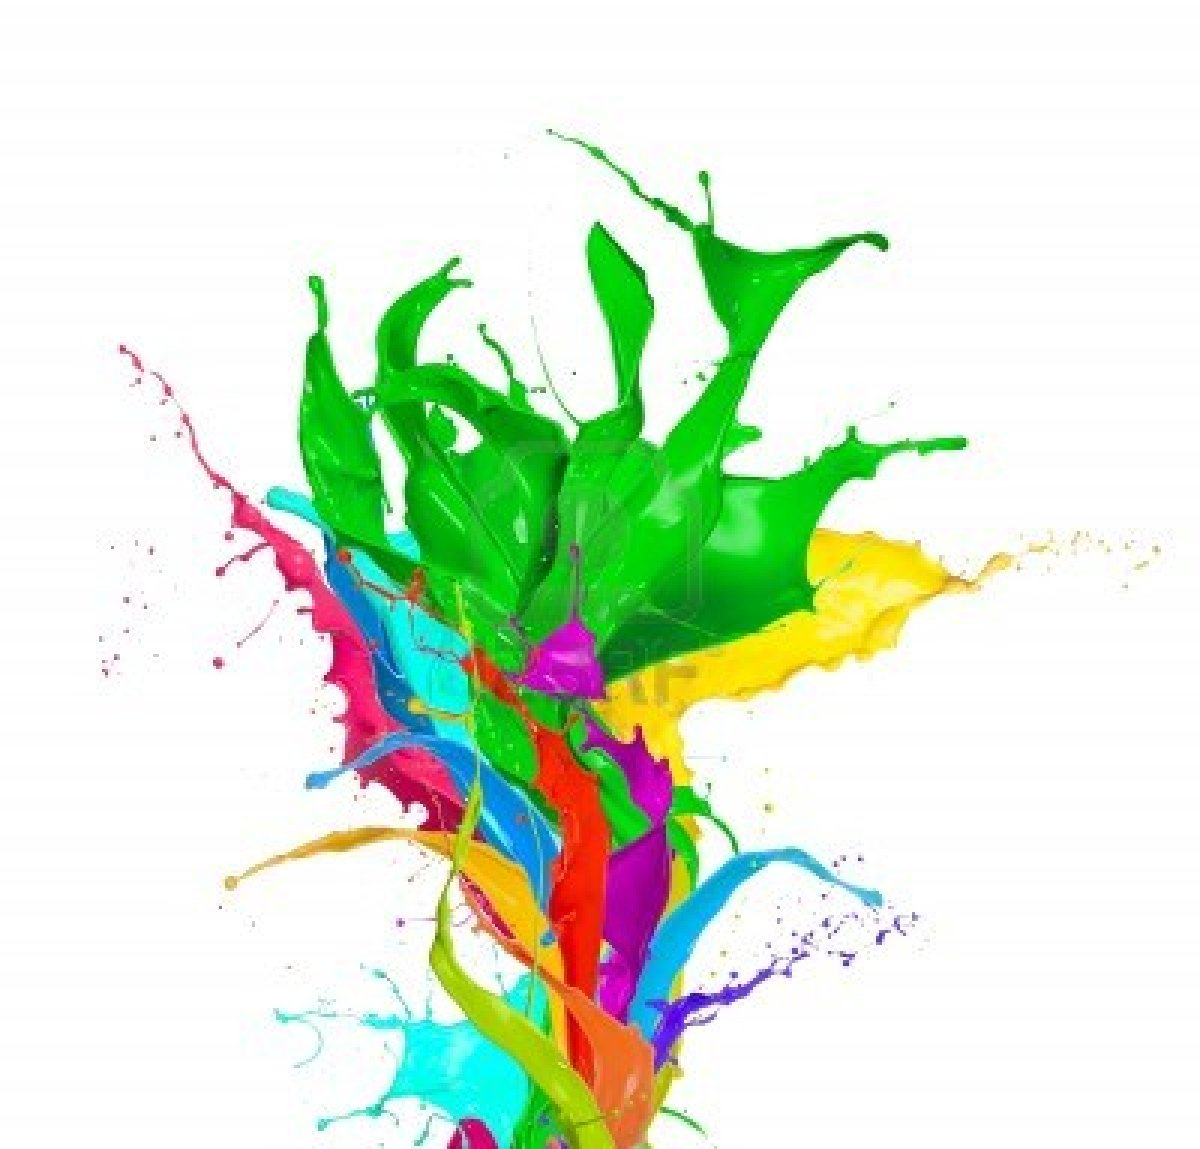 Splash paint background